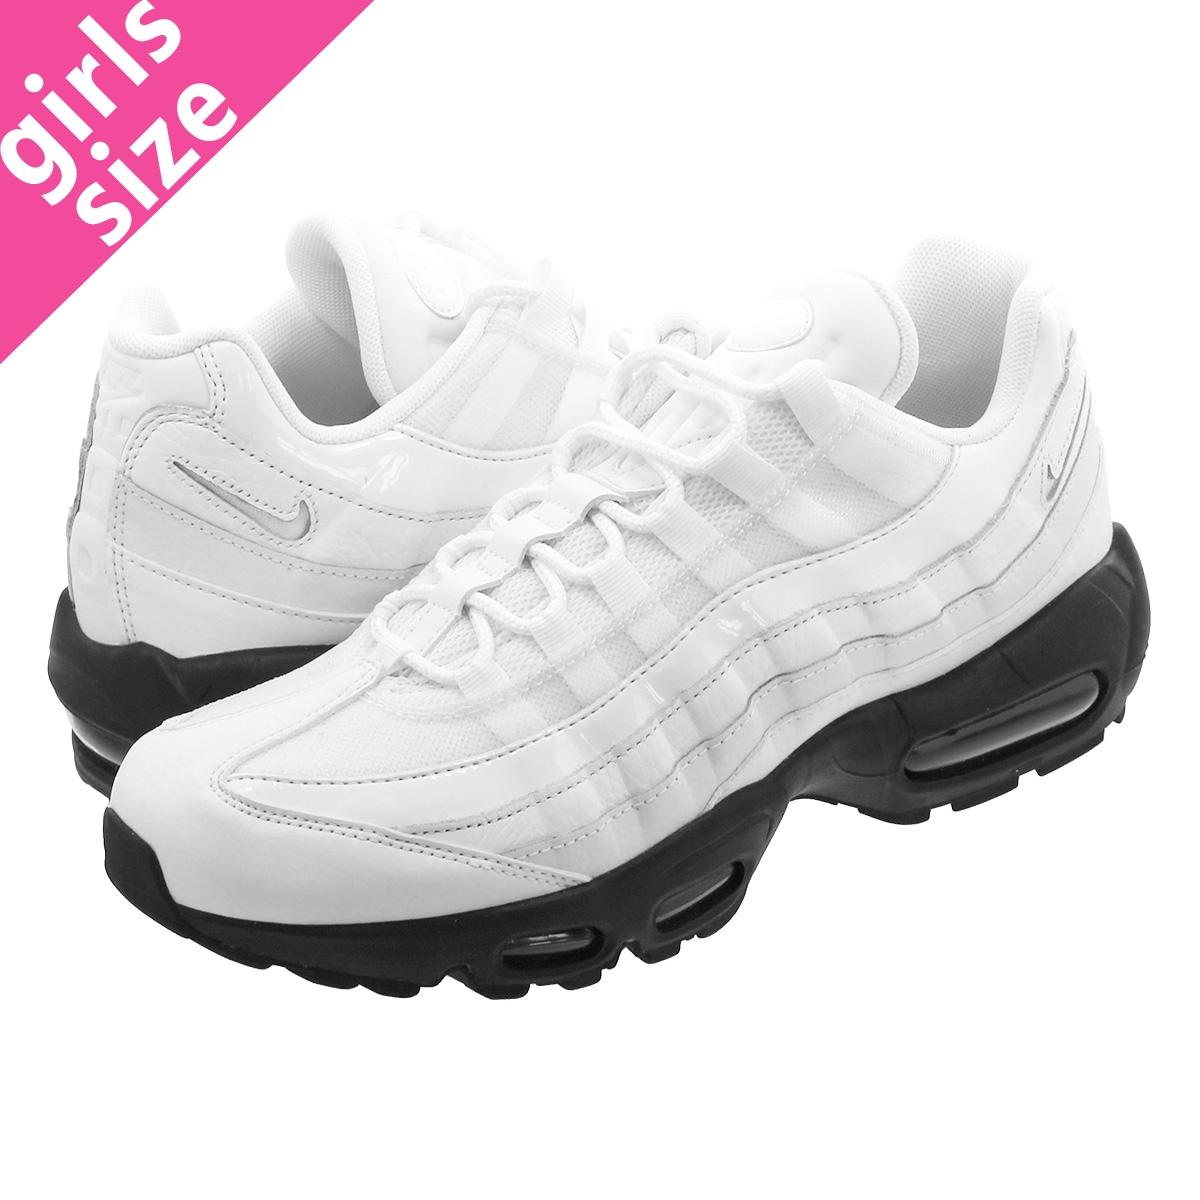 NIKE WMNS AIR MAX 95 SE Nike women Air Max 95 SE SUMMIT WHITESUMMIT WHITEBLACK aq4138 102